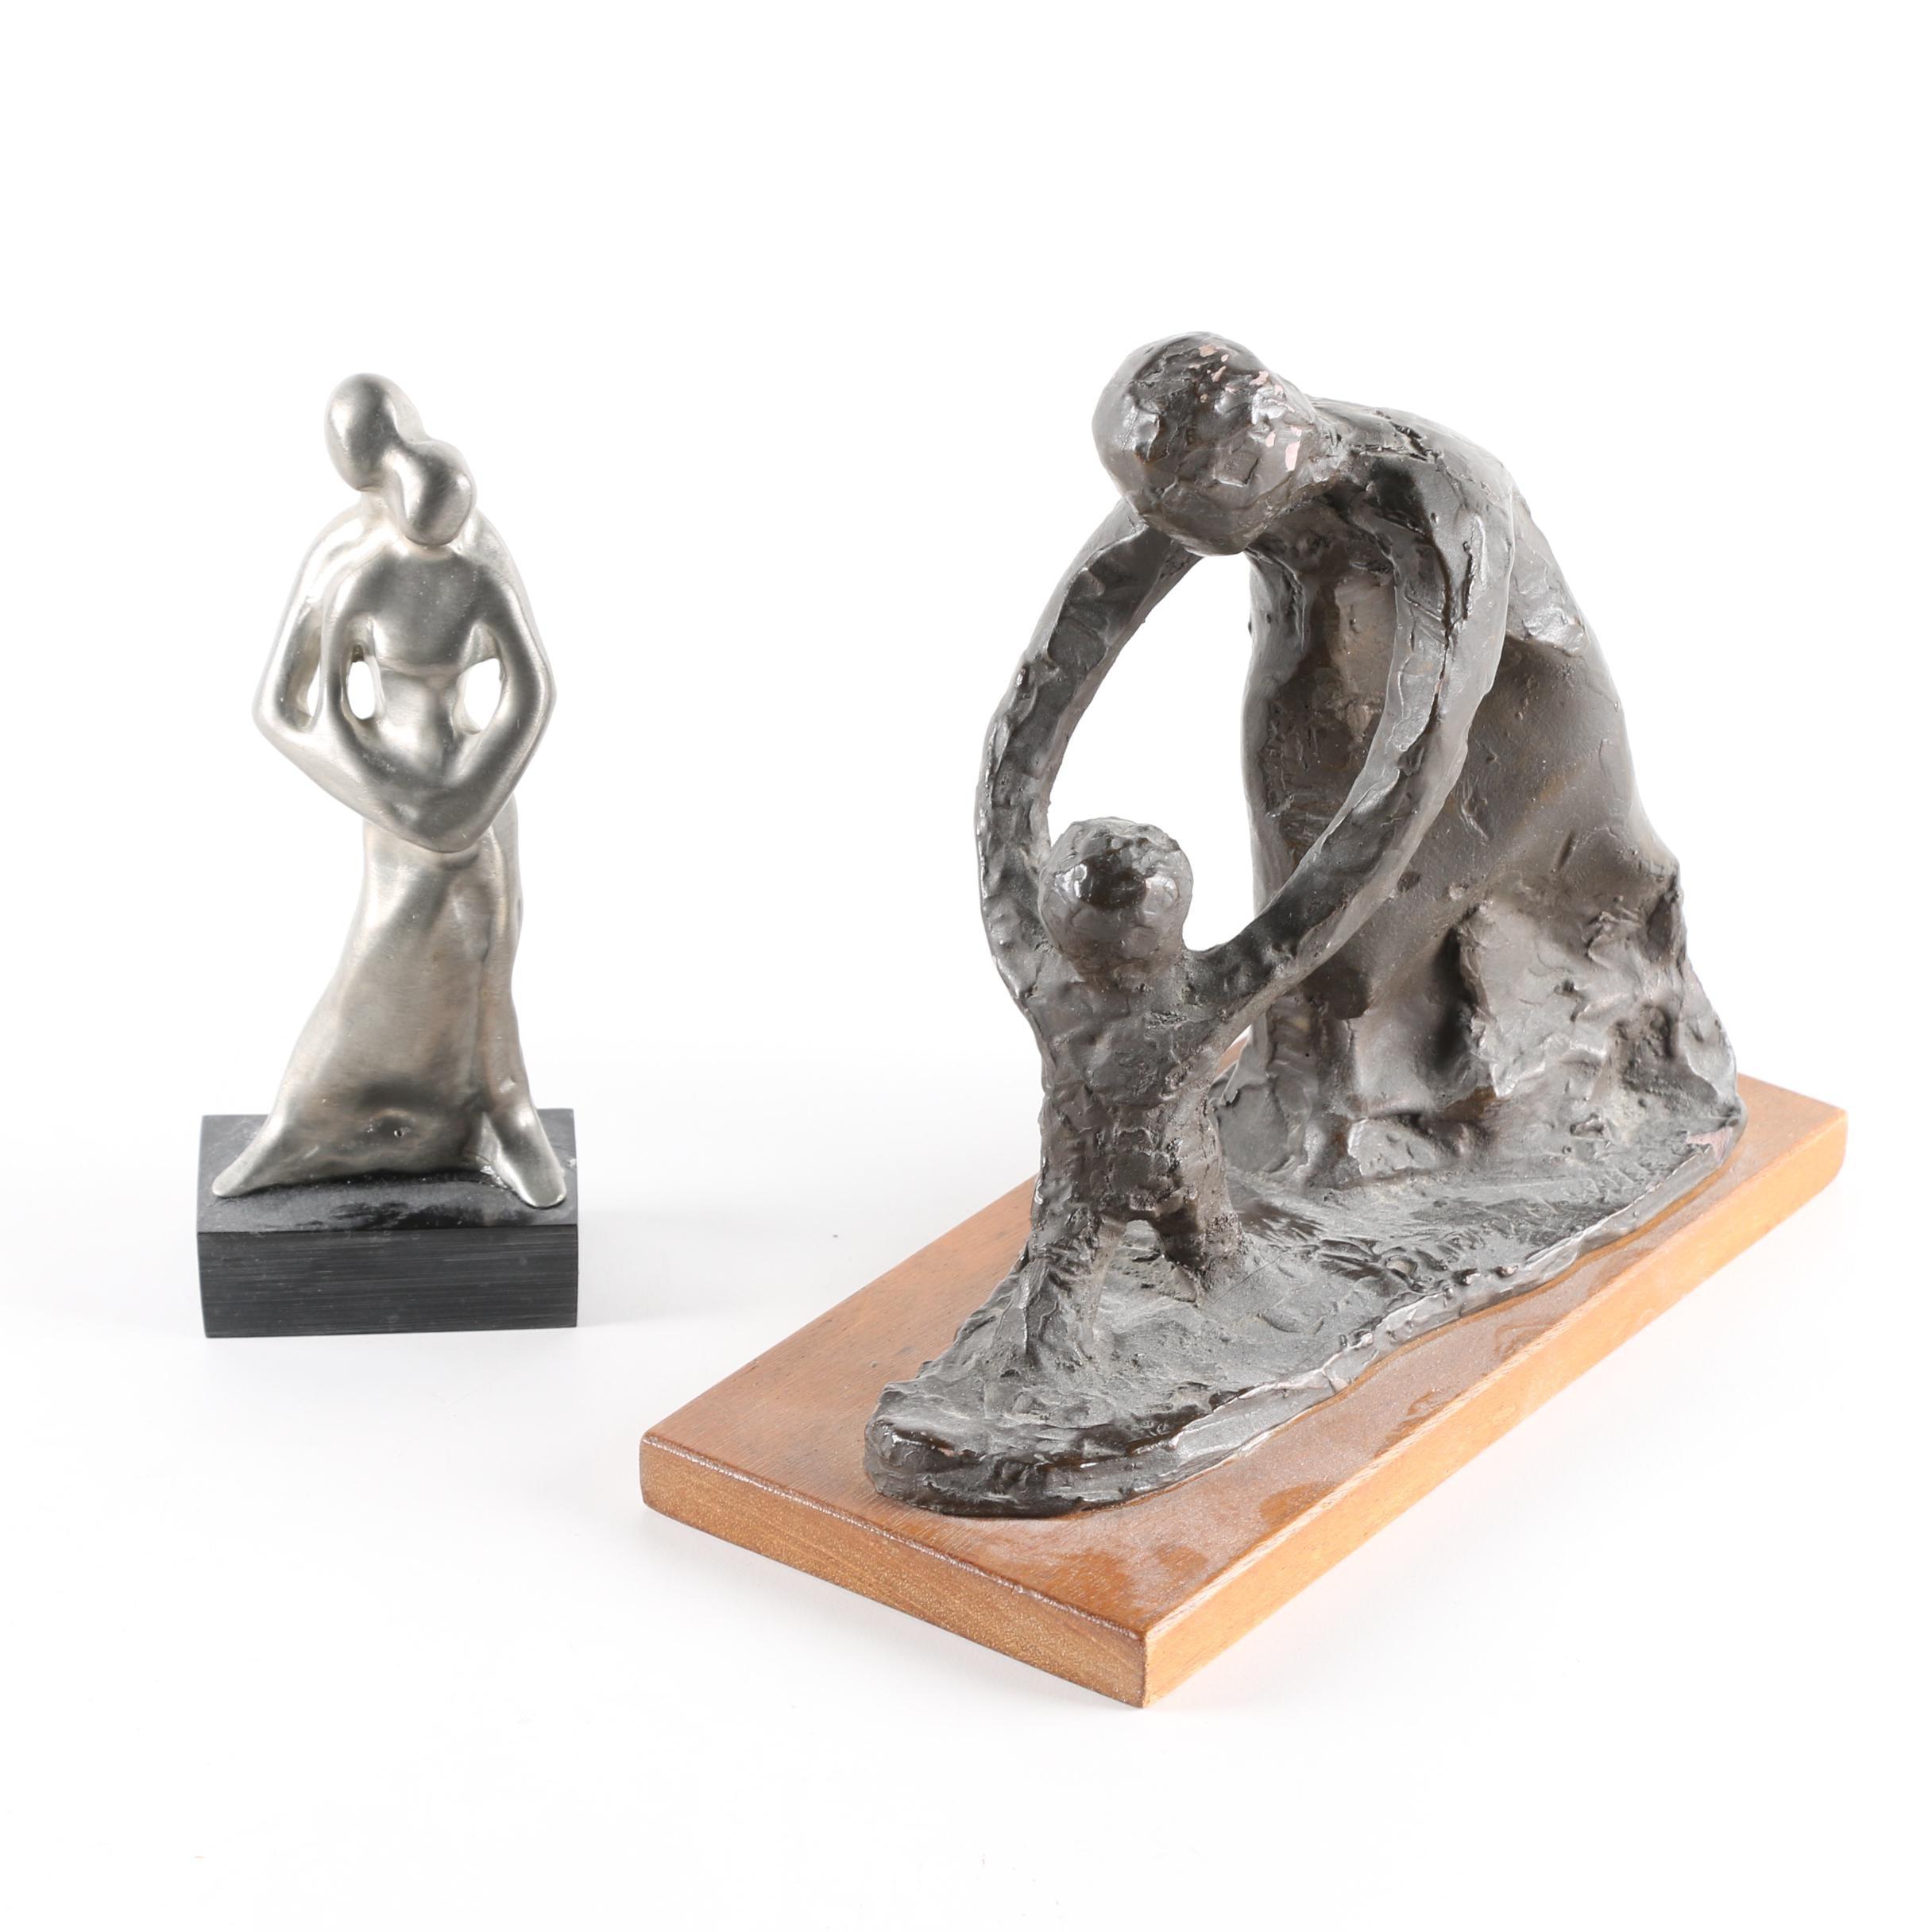 Figural Metal, Plaster and Wood Sculptures